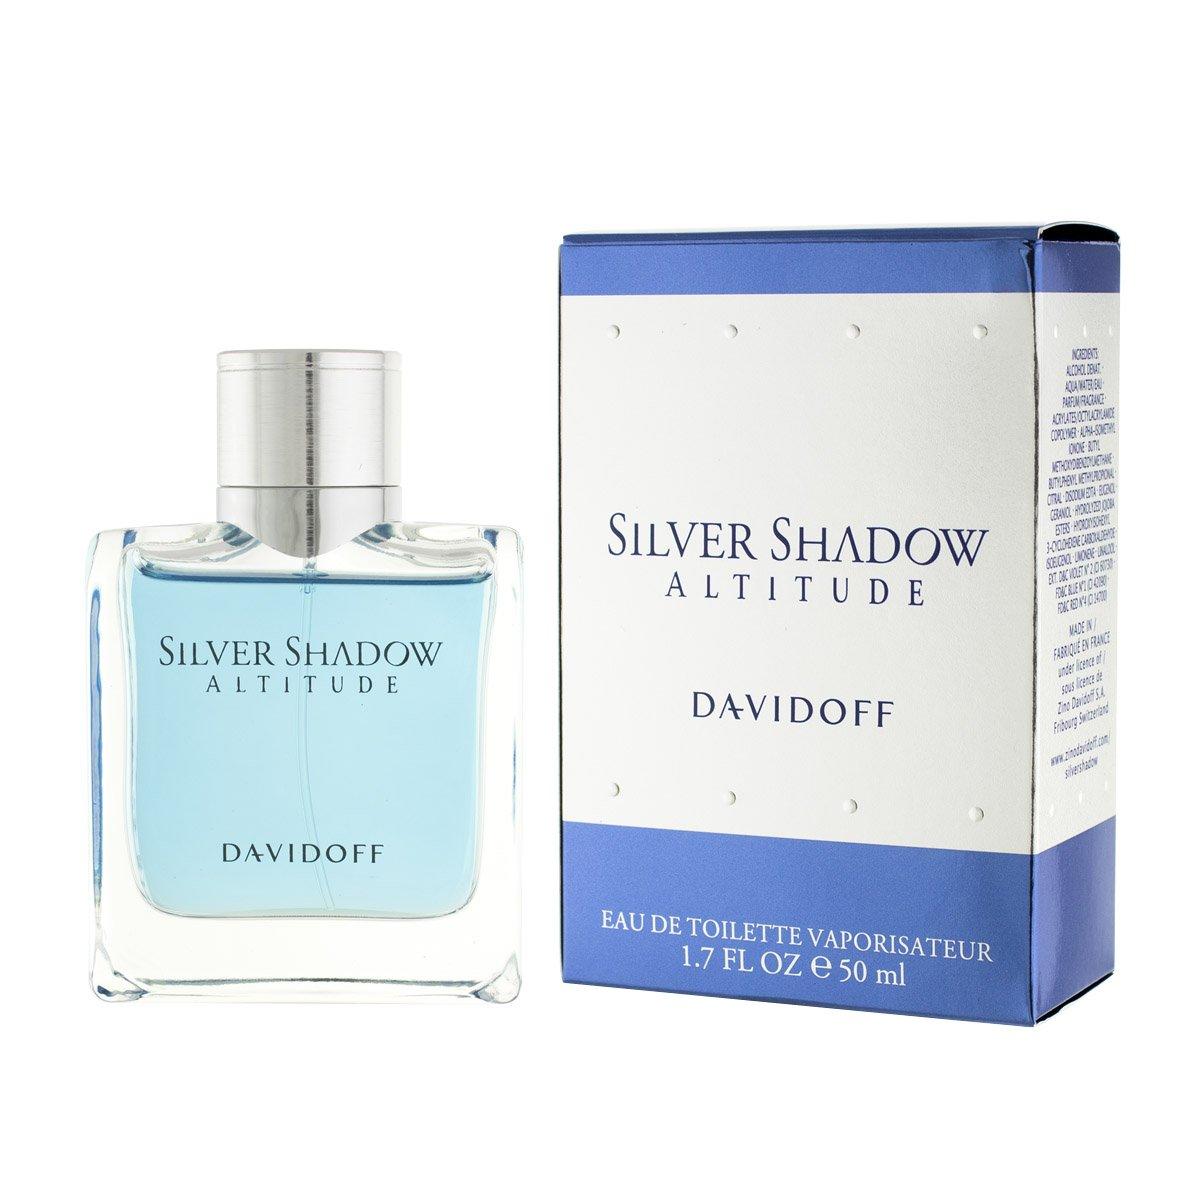 Davidoff Silver Shadow Altitude Eau De Toilette 50 Ml Man Amazon